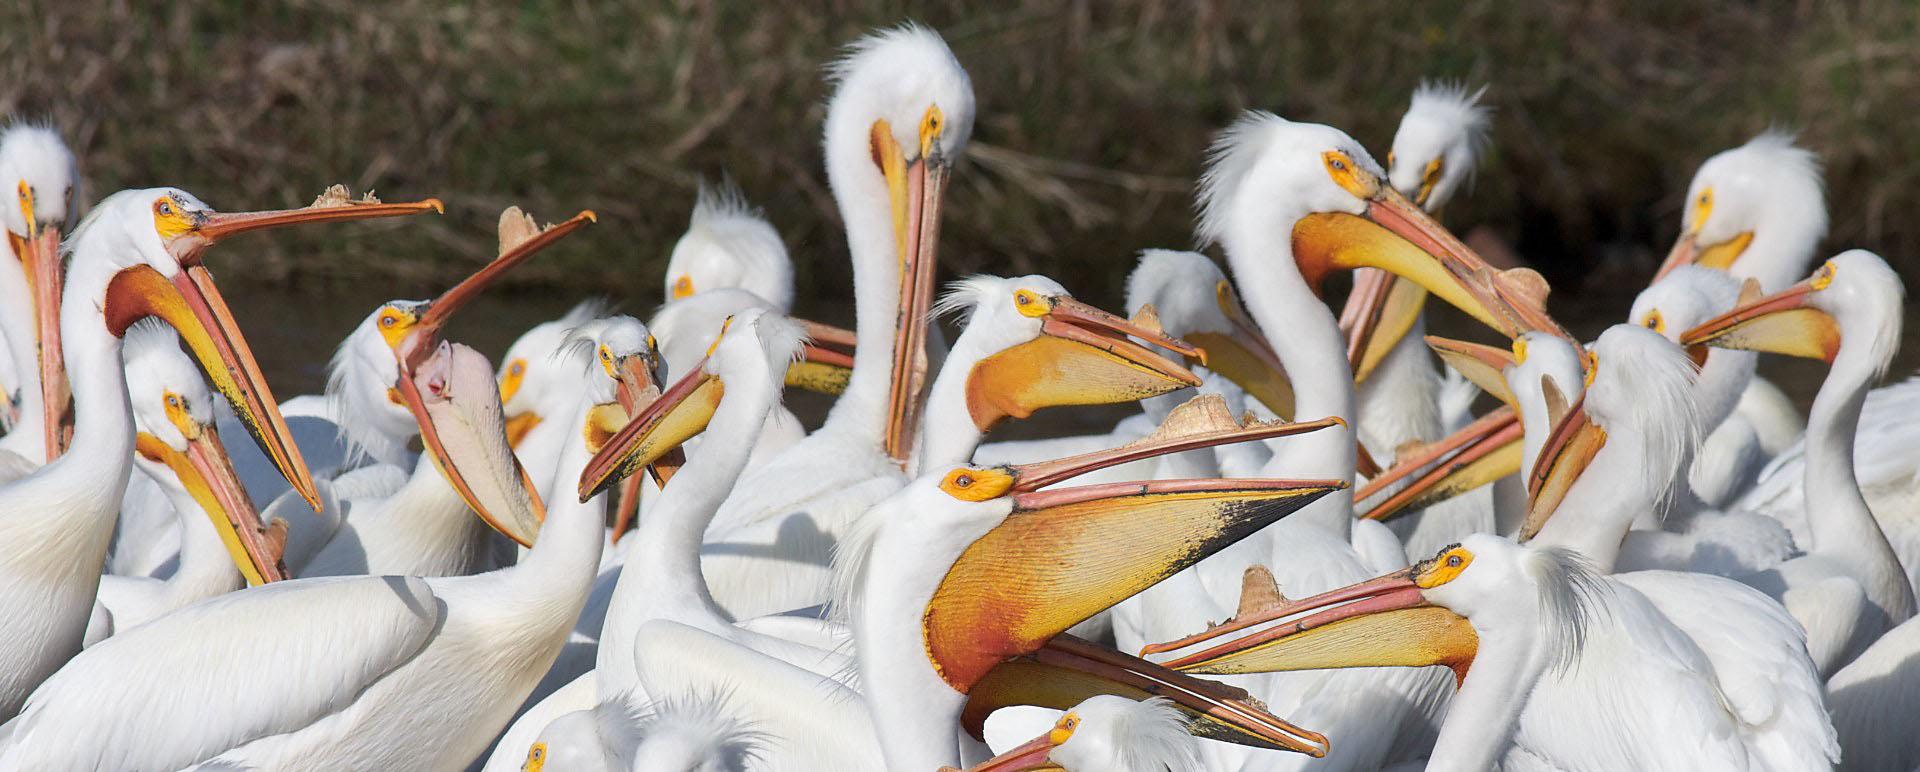 American White Pelicans St. Louis River Fond du Lac MN IMG_0006664